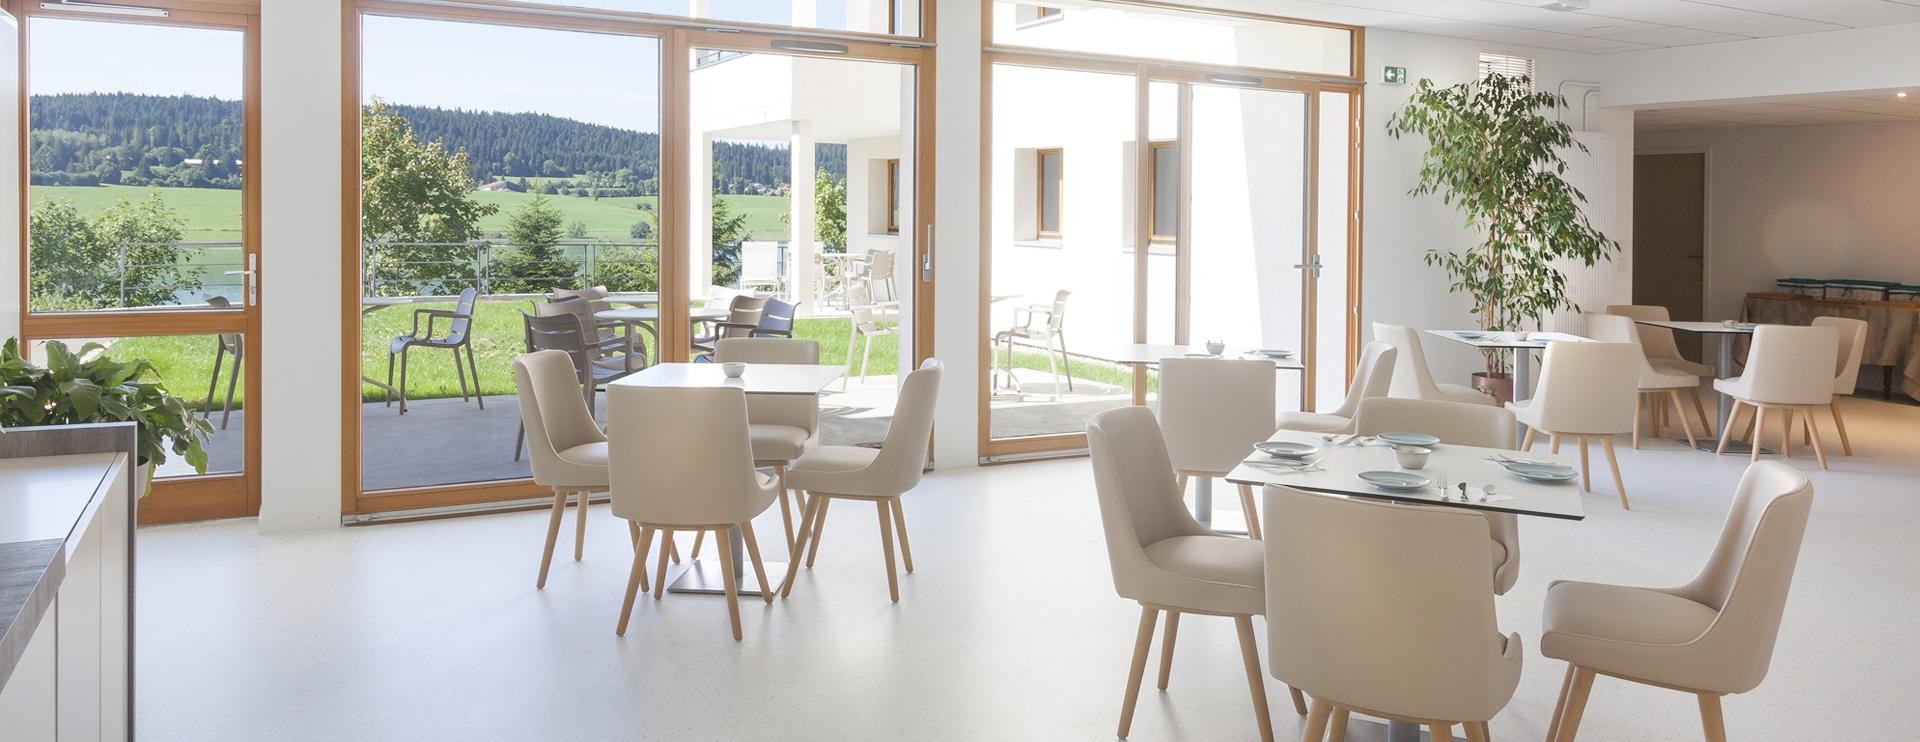 Petit-déjeuner hôtel spa Doubs